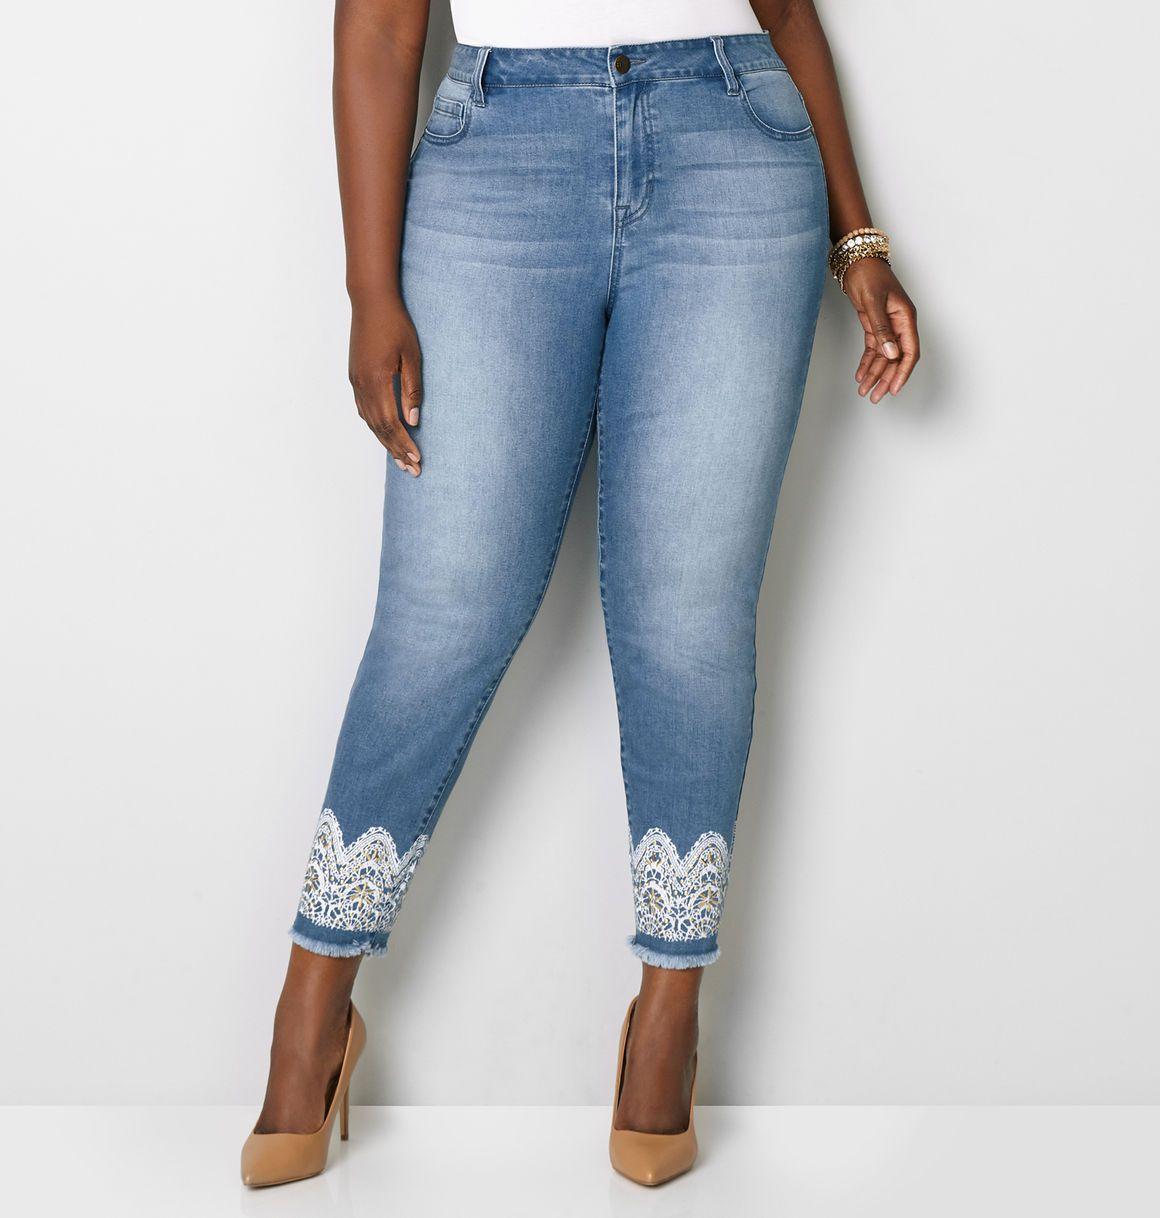 0f6511276 1432 Frayed Lace Skinny Jean1432 Frayed Lace Skinny Jean